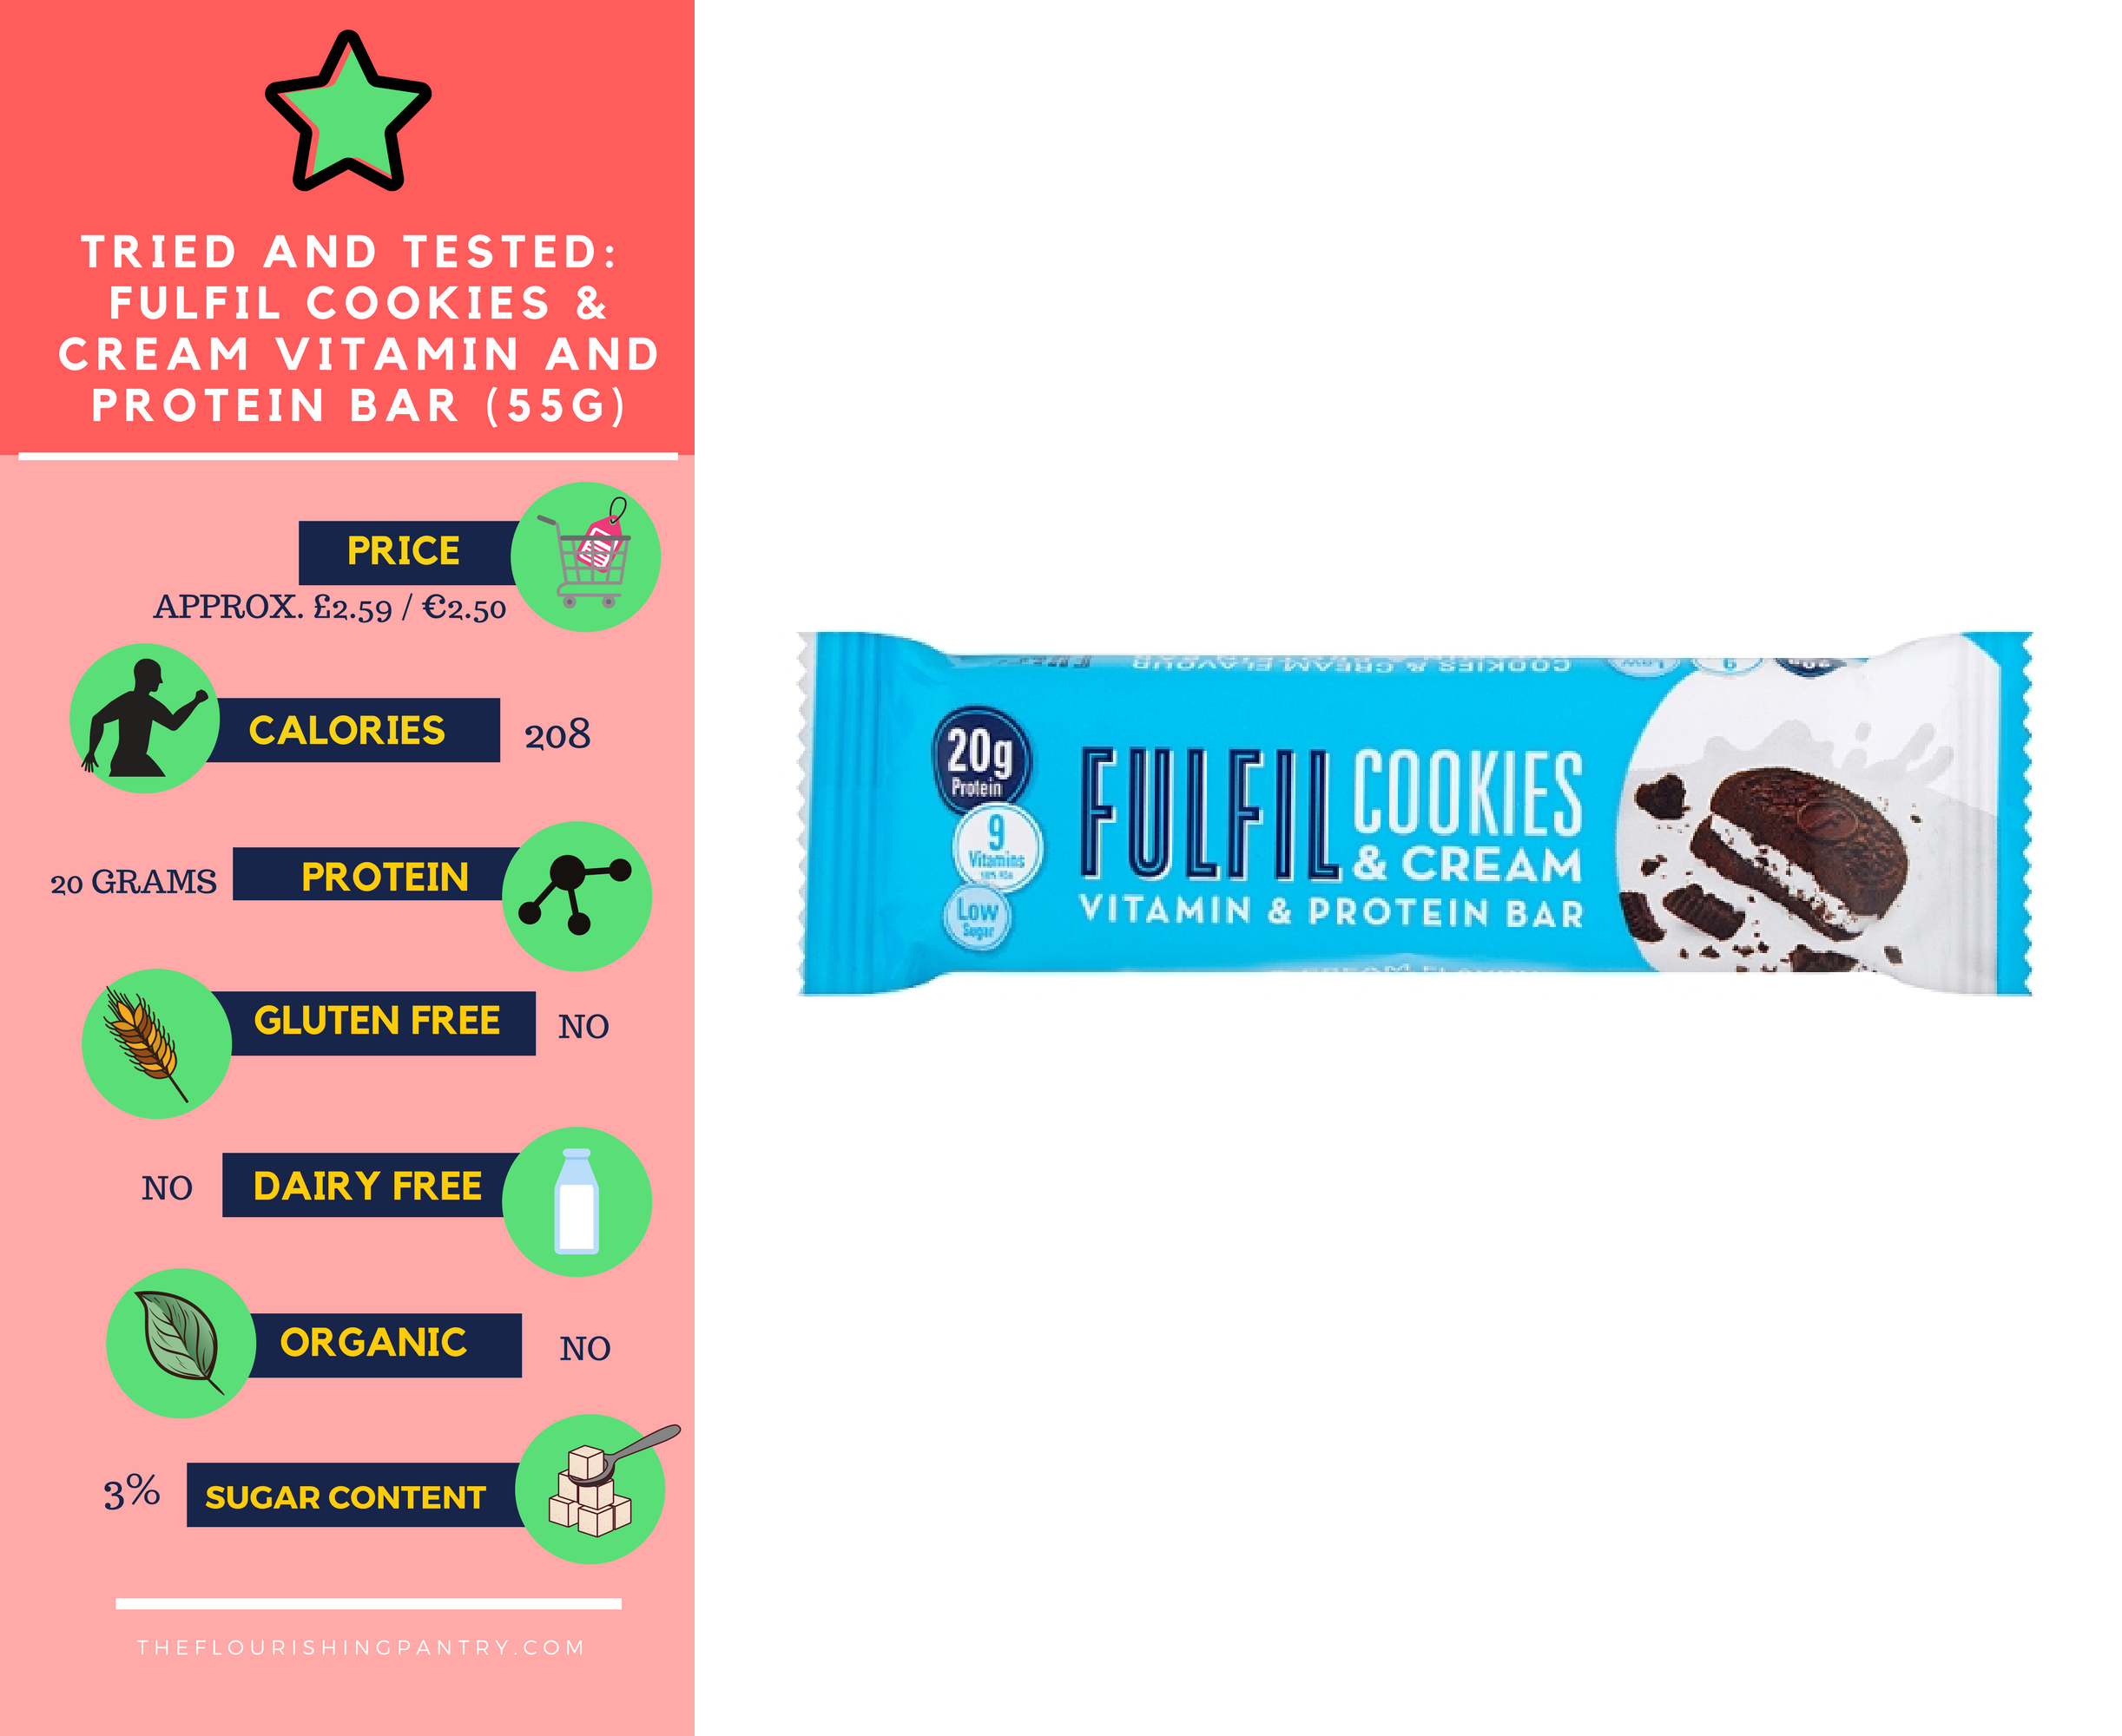 Fulfil Cookies & Cream | The Flourishing Pantry